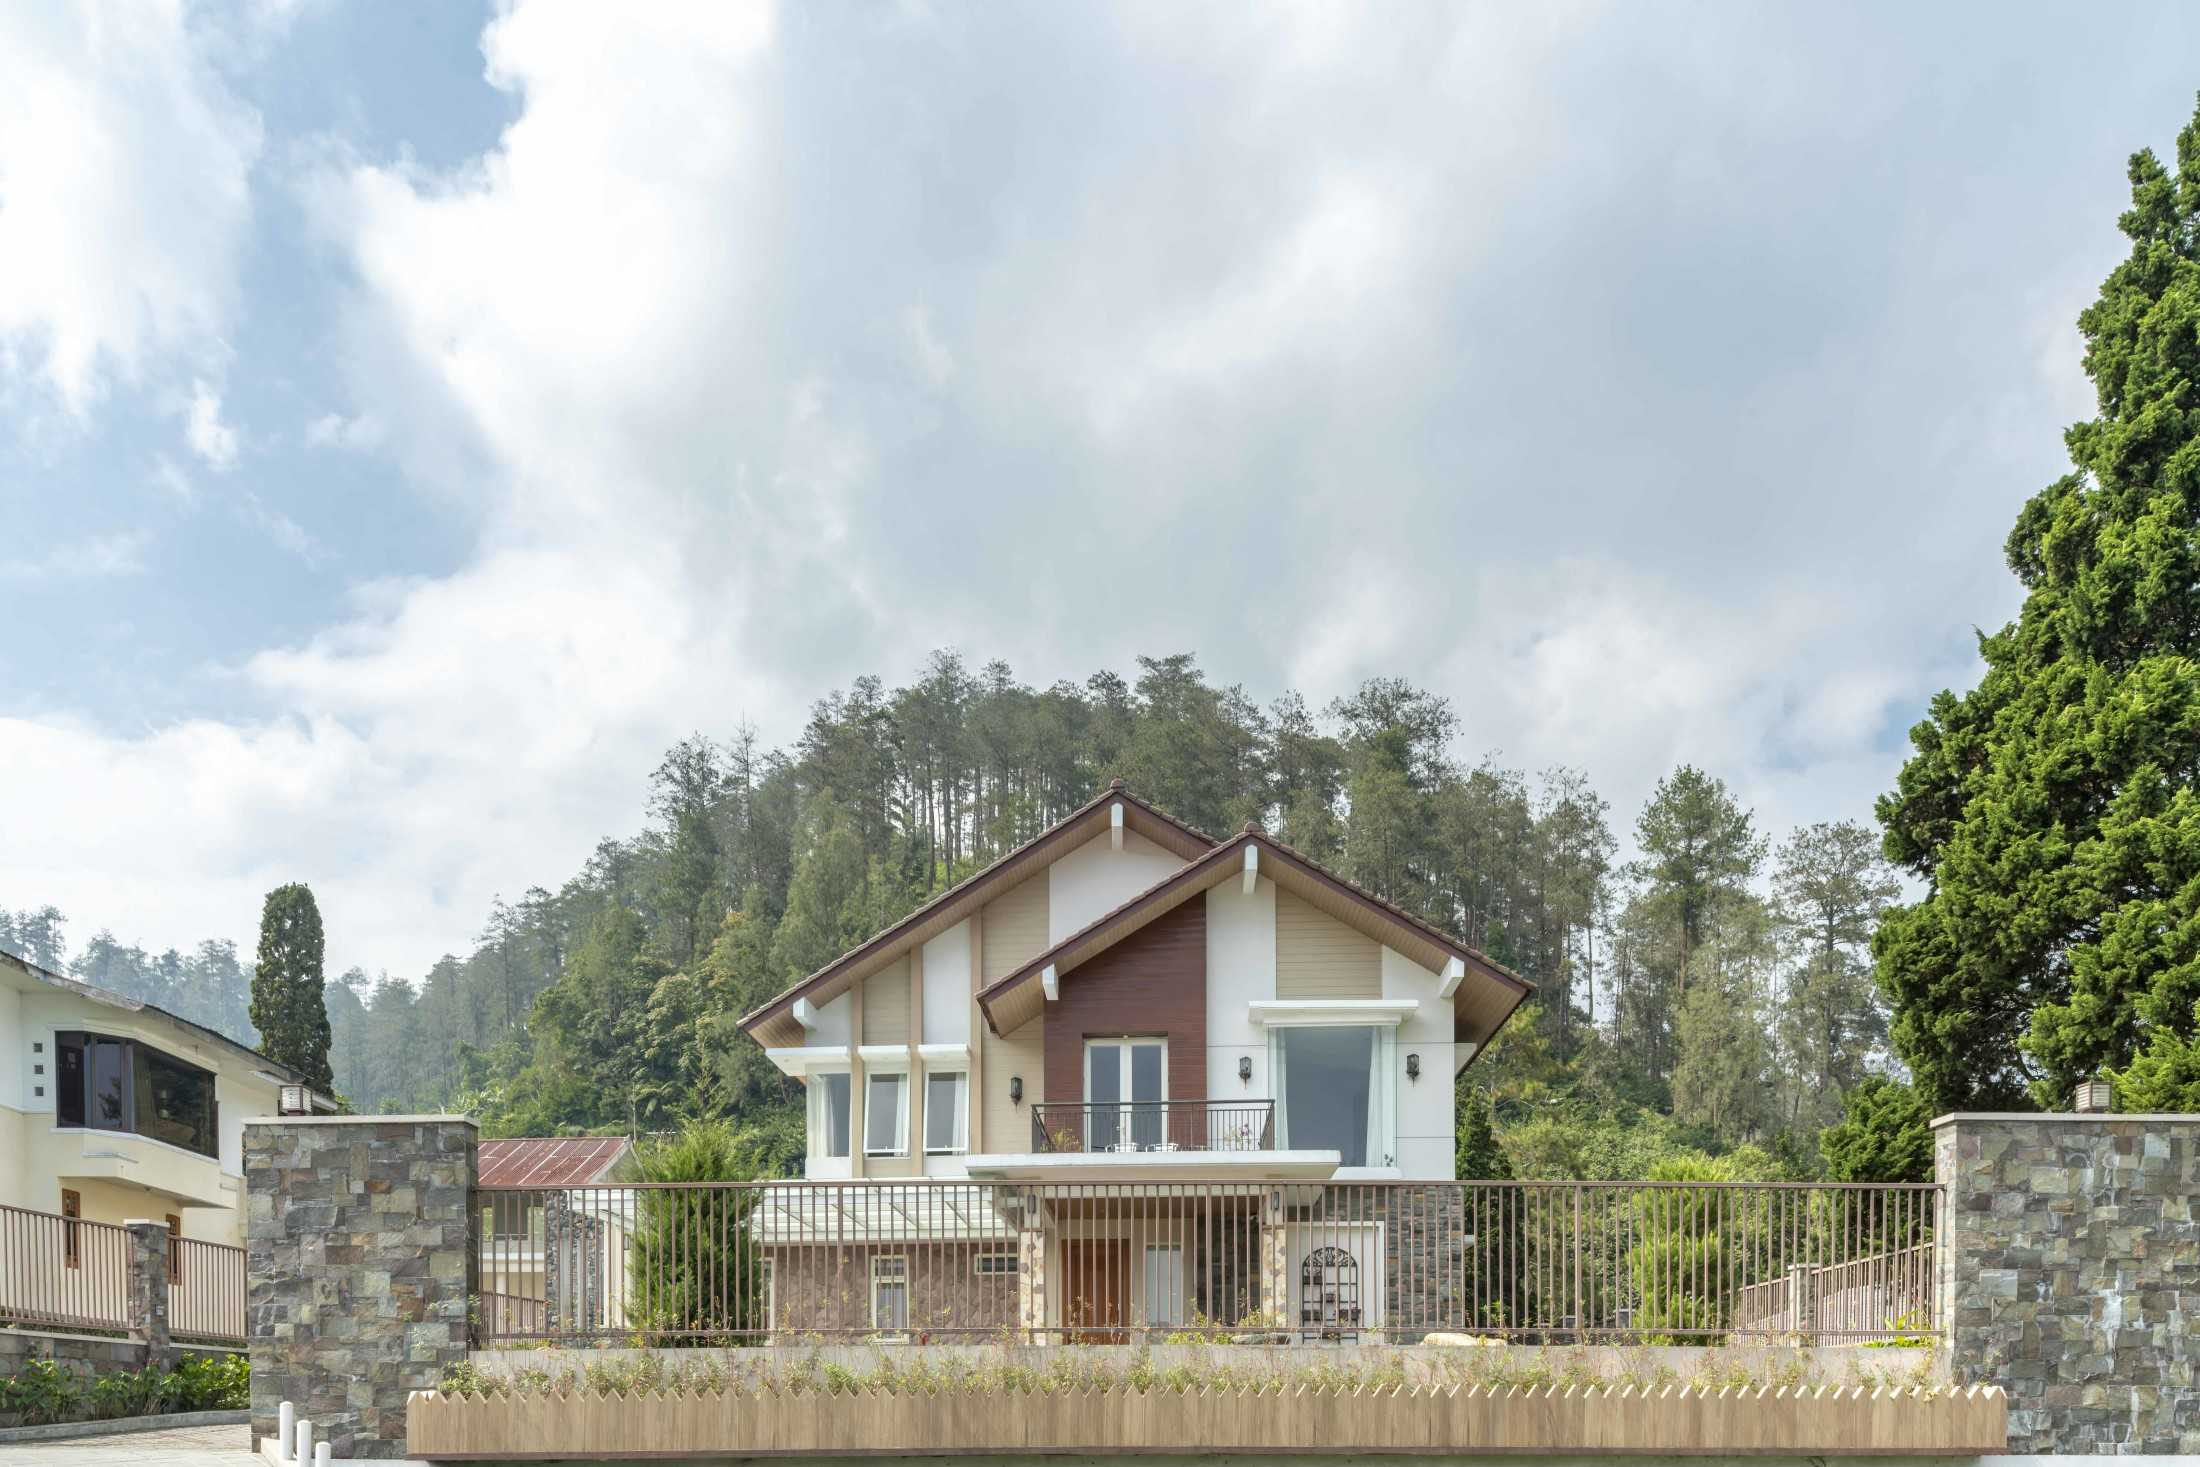 Conarch Studio Breezy Tropical Villa Kec. Tawangmangu, Kabupaten Karanganyar, Jawa Tengah, Indonesia Kec. Tawangmangu, Kabupaten Karanganyar, Jawa Tengah, Indonesia Exterior Tropical 126657